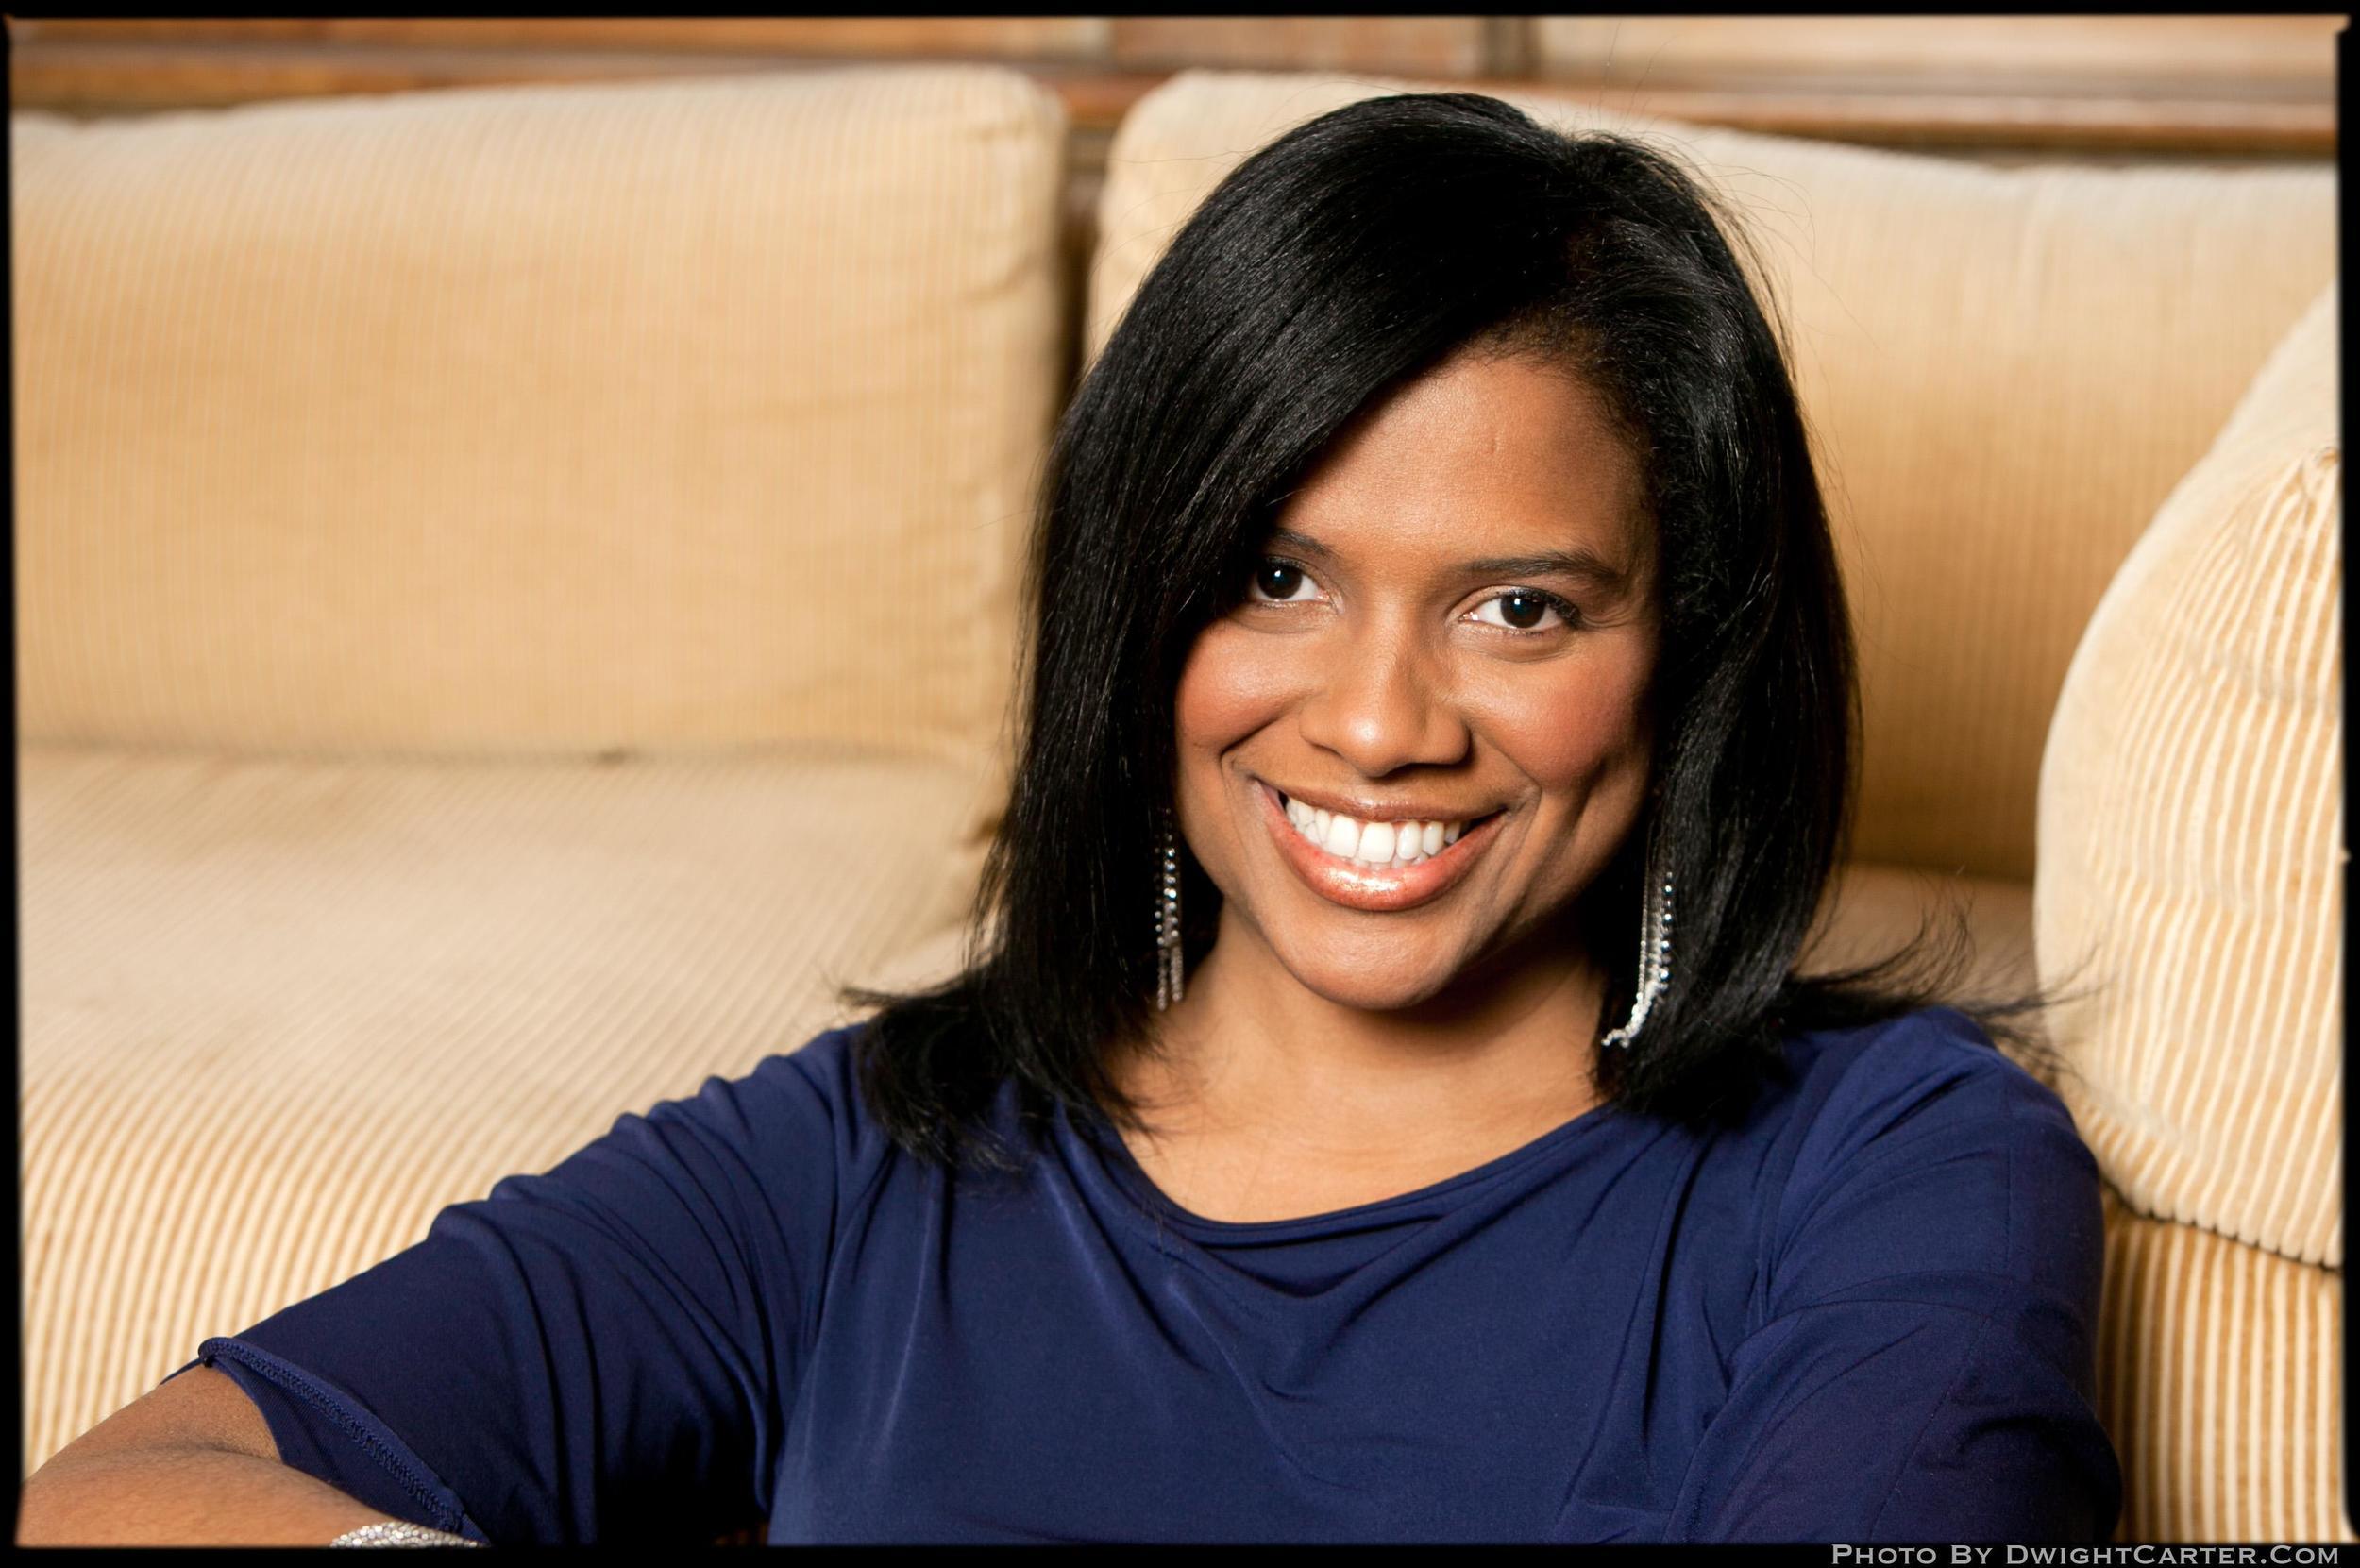 Book marketing expert, Maryann Reid